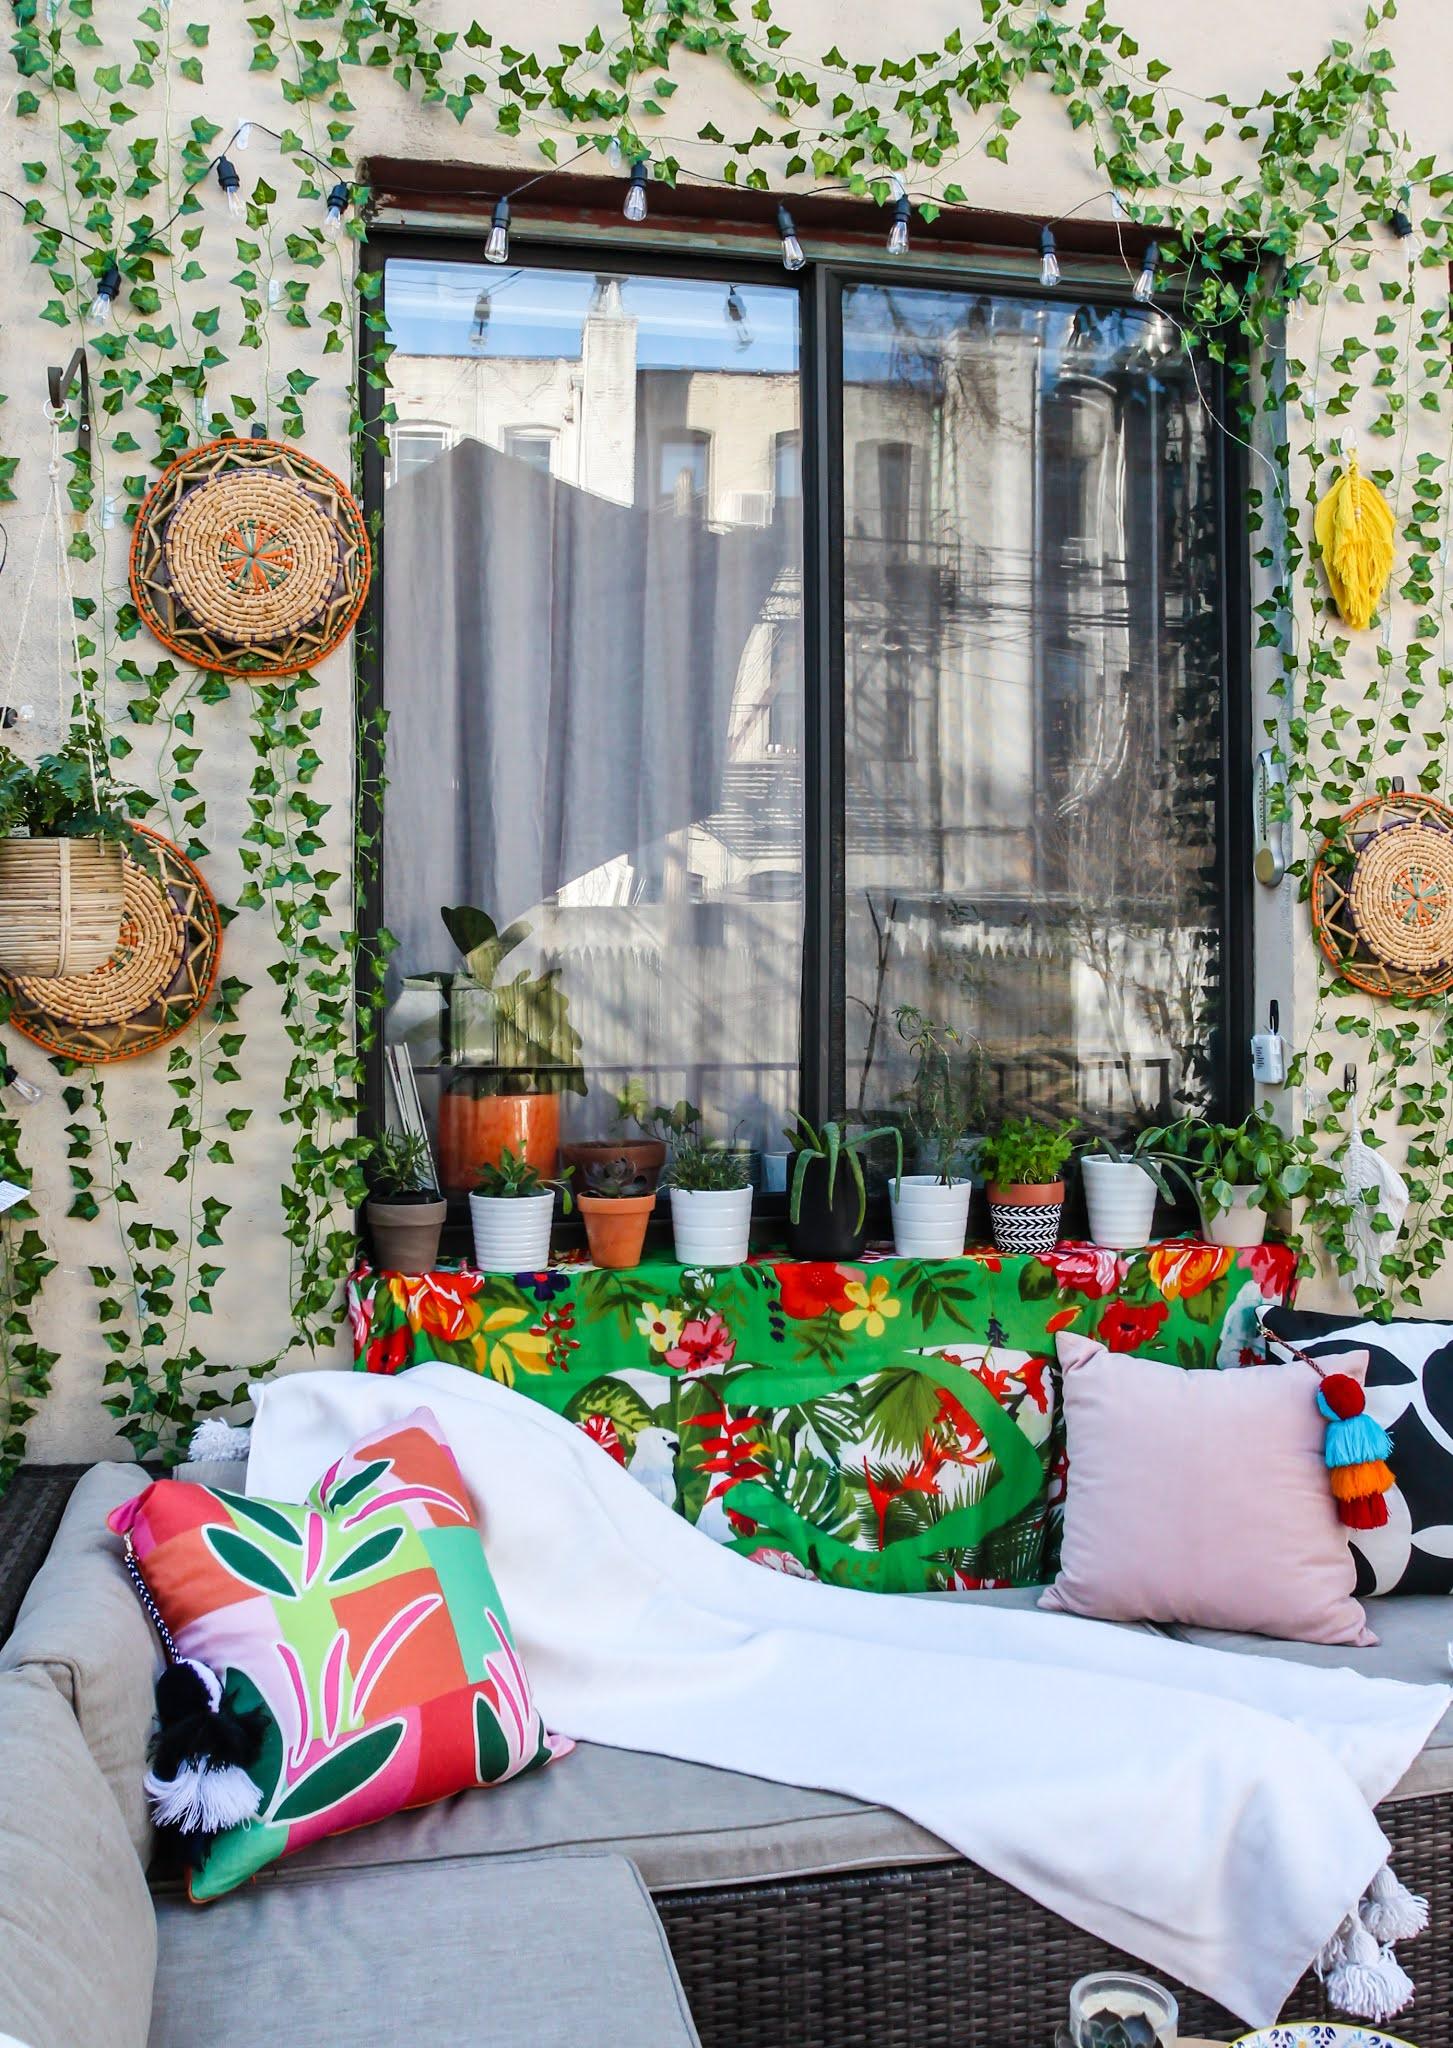 Renter-Friendly Patio Decor,  patio decor, faux ivy wall, command outdoor light clips, patio decor ideas, faux ivy wall diy, small space patio decor, small patio design ideas, NYC balcony ideas, NYC patio ideas